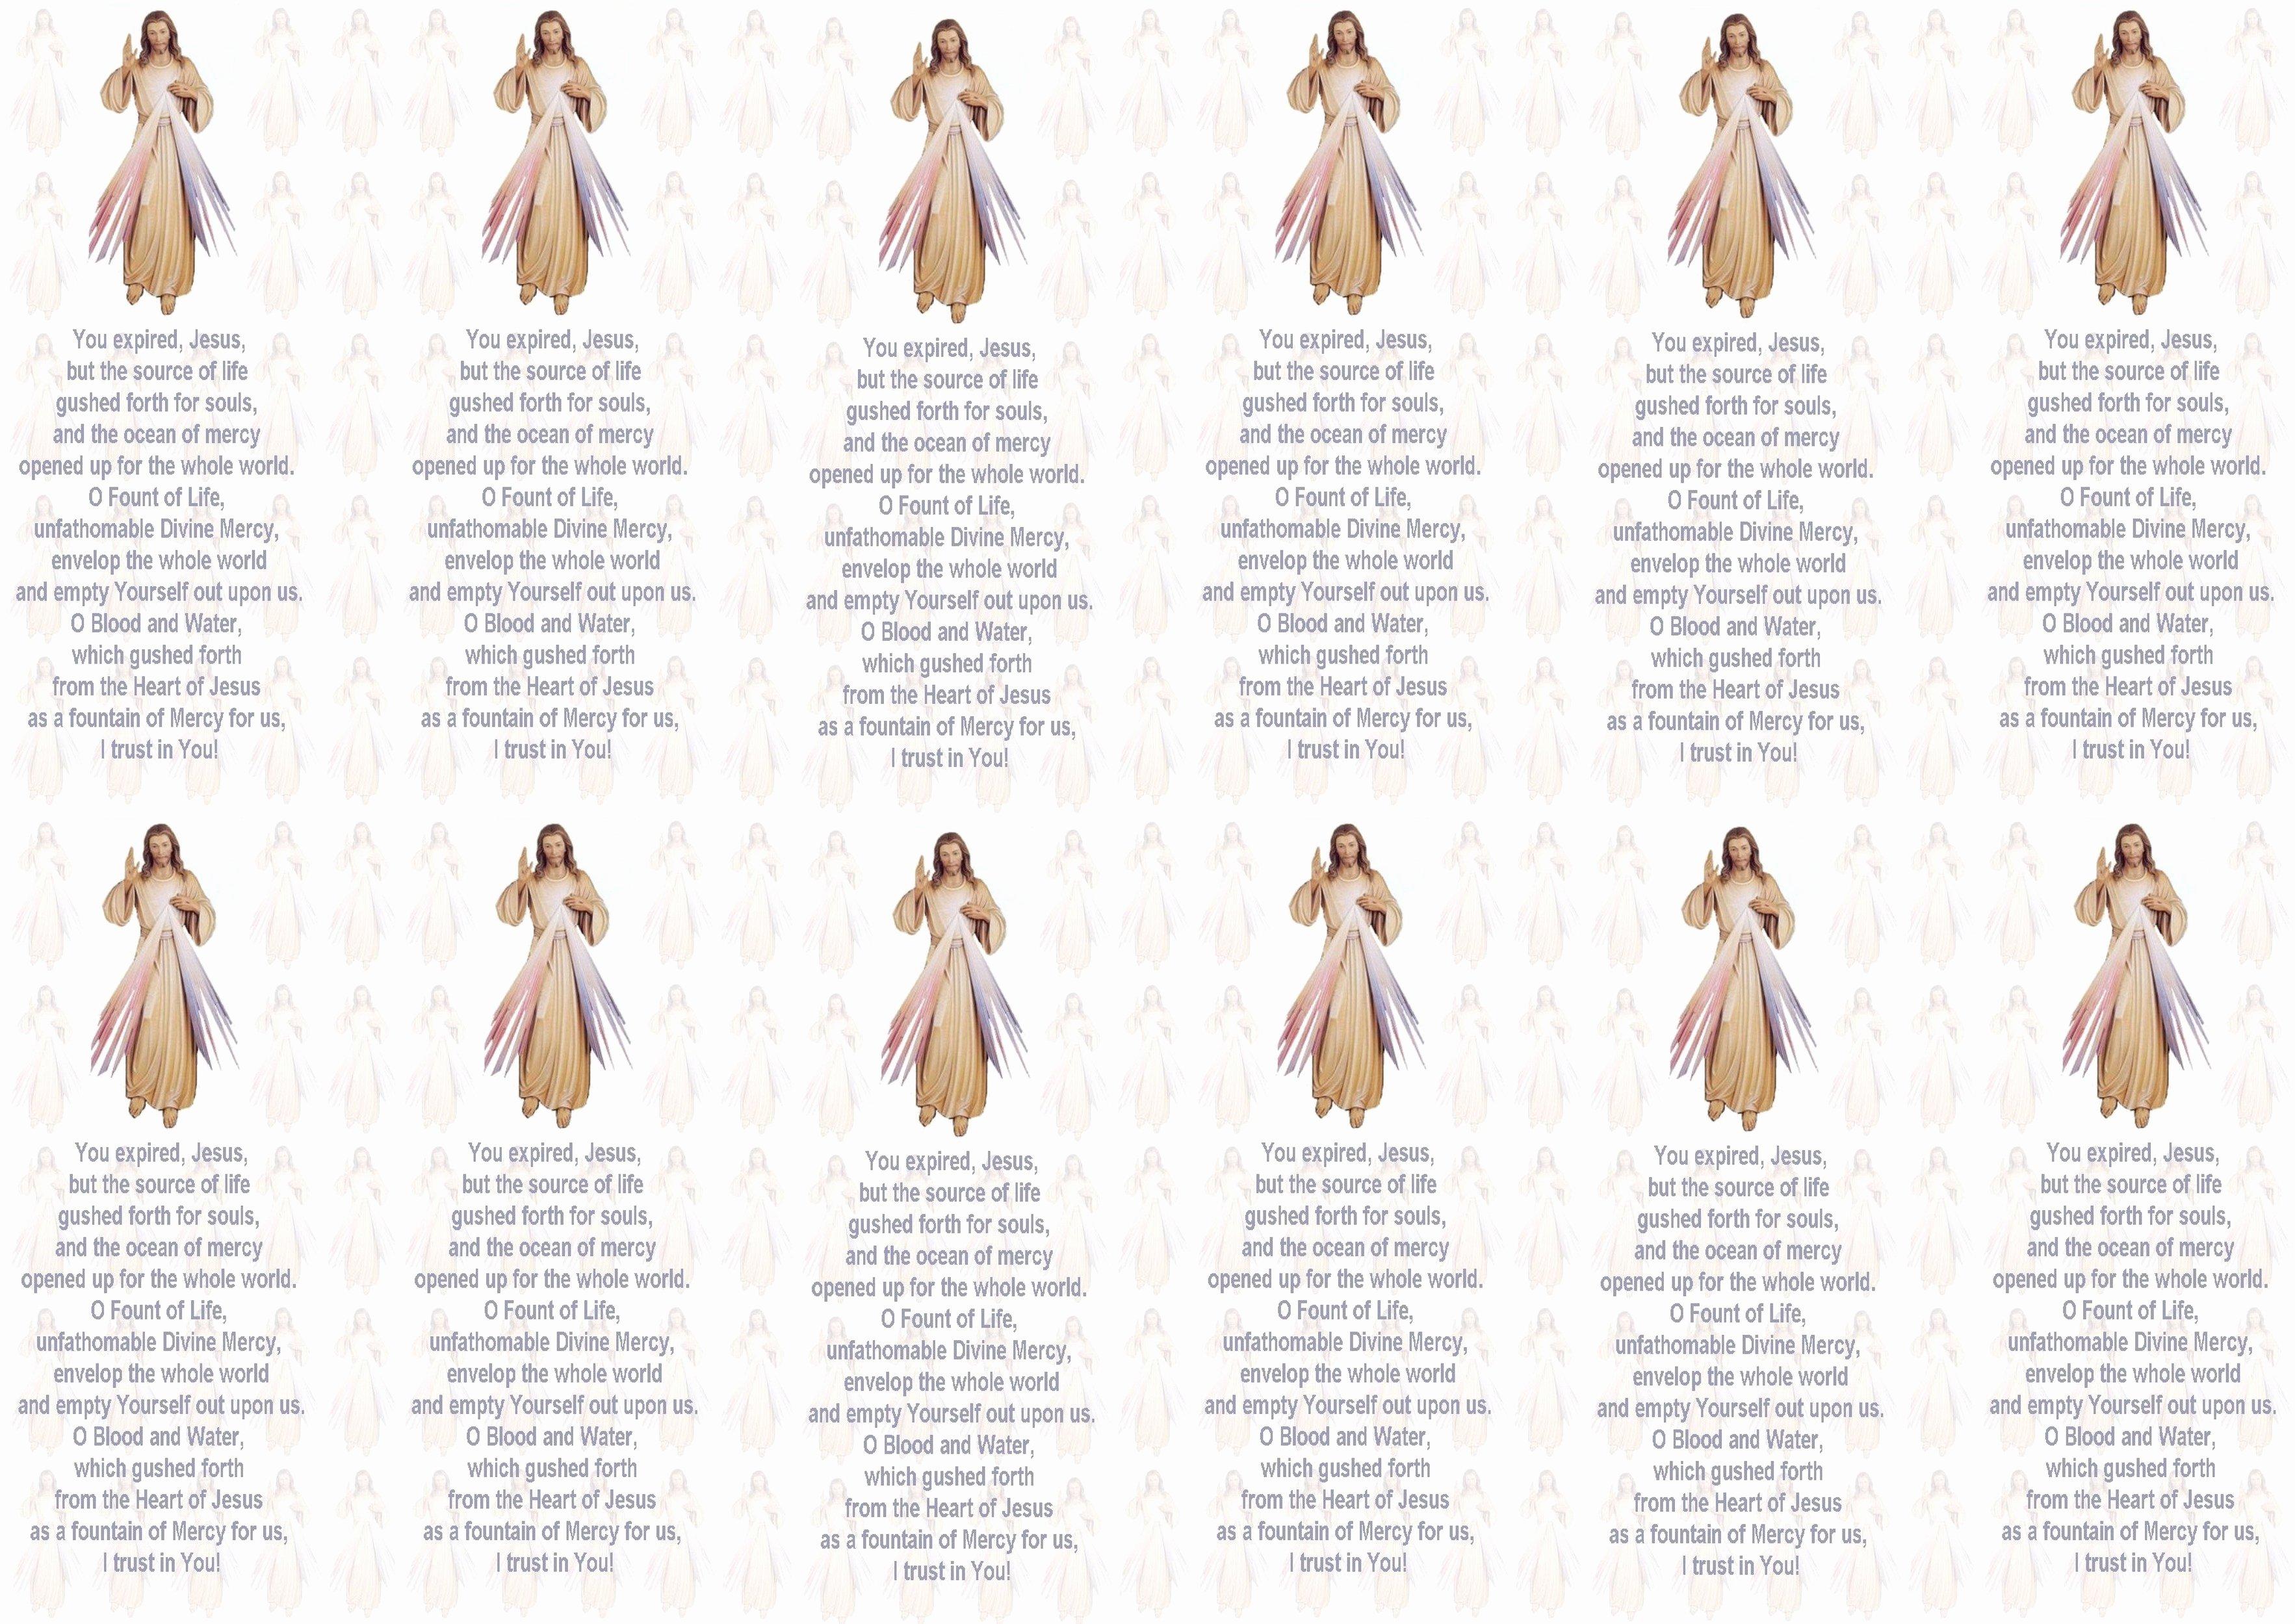 Prayer Request Cards Free Printables Elegant Free Printable Prayer Cards – Divine Mercy Prayer Cards